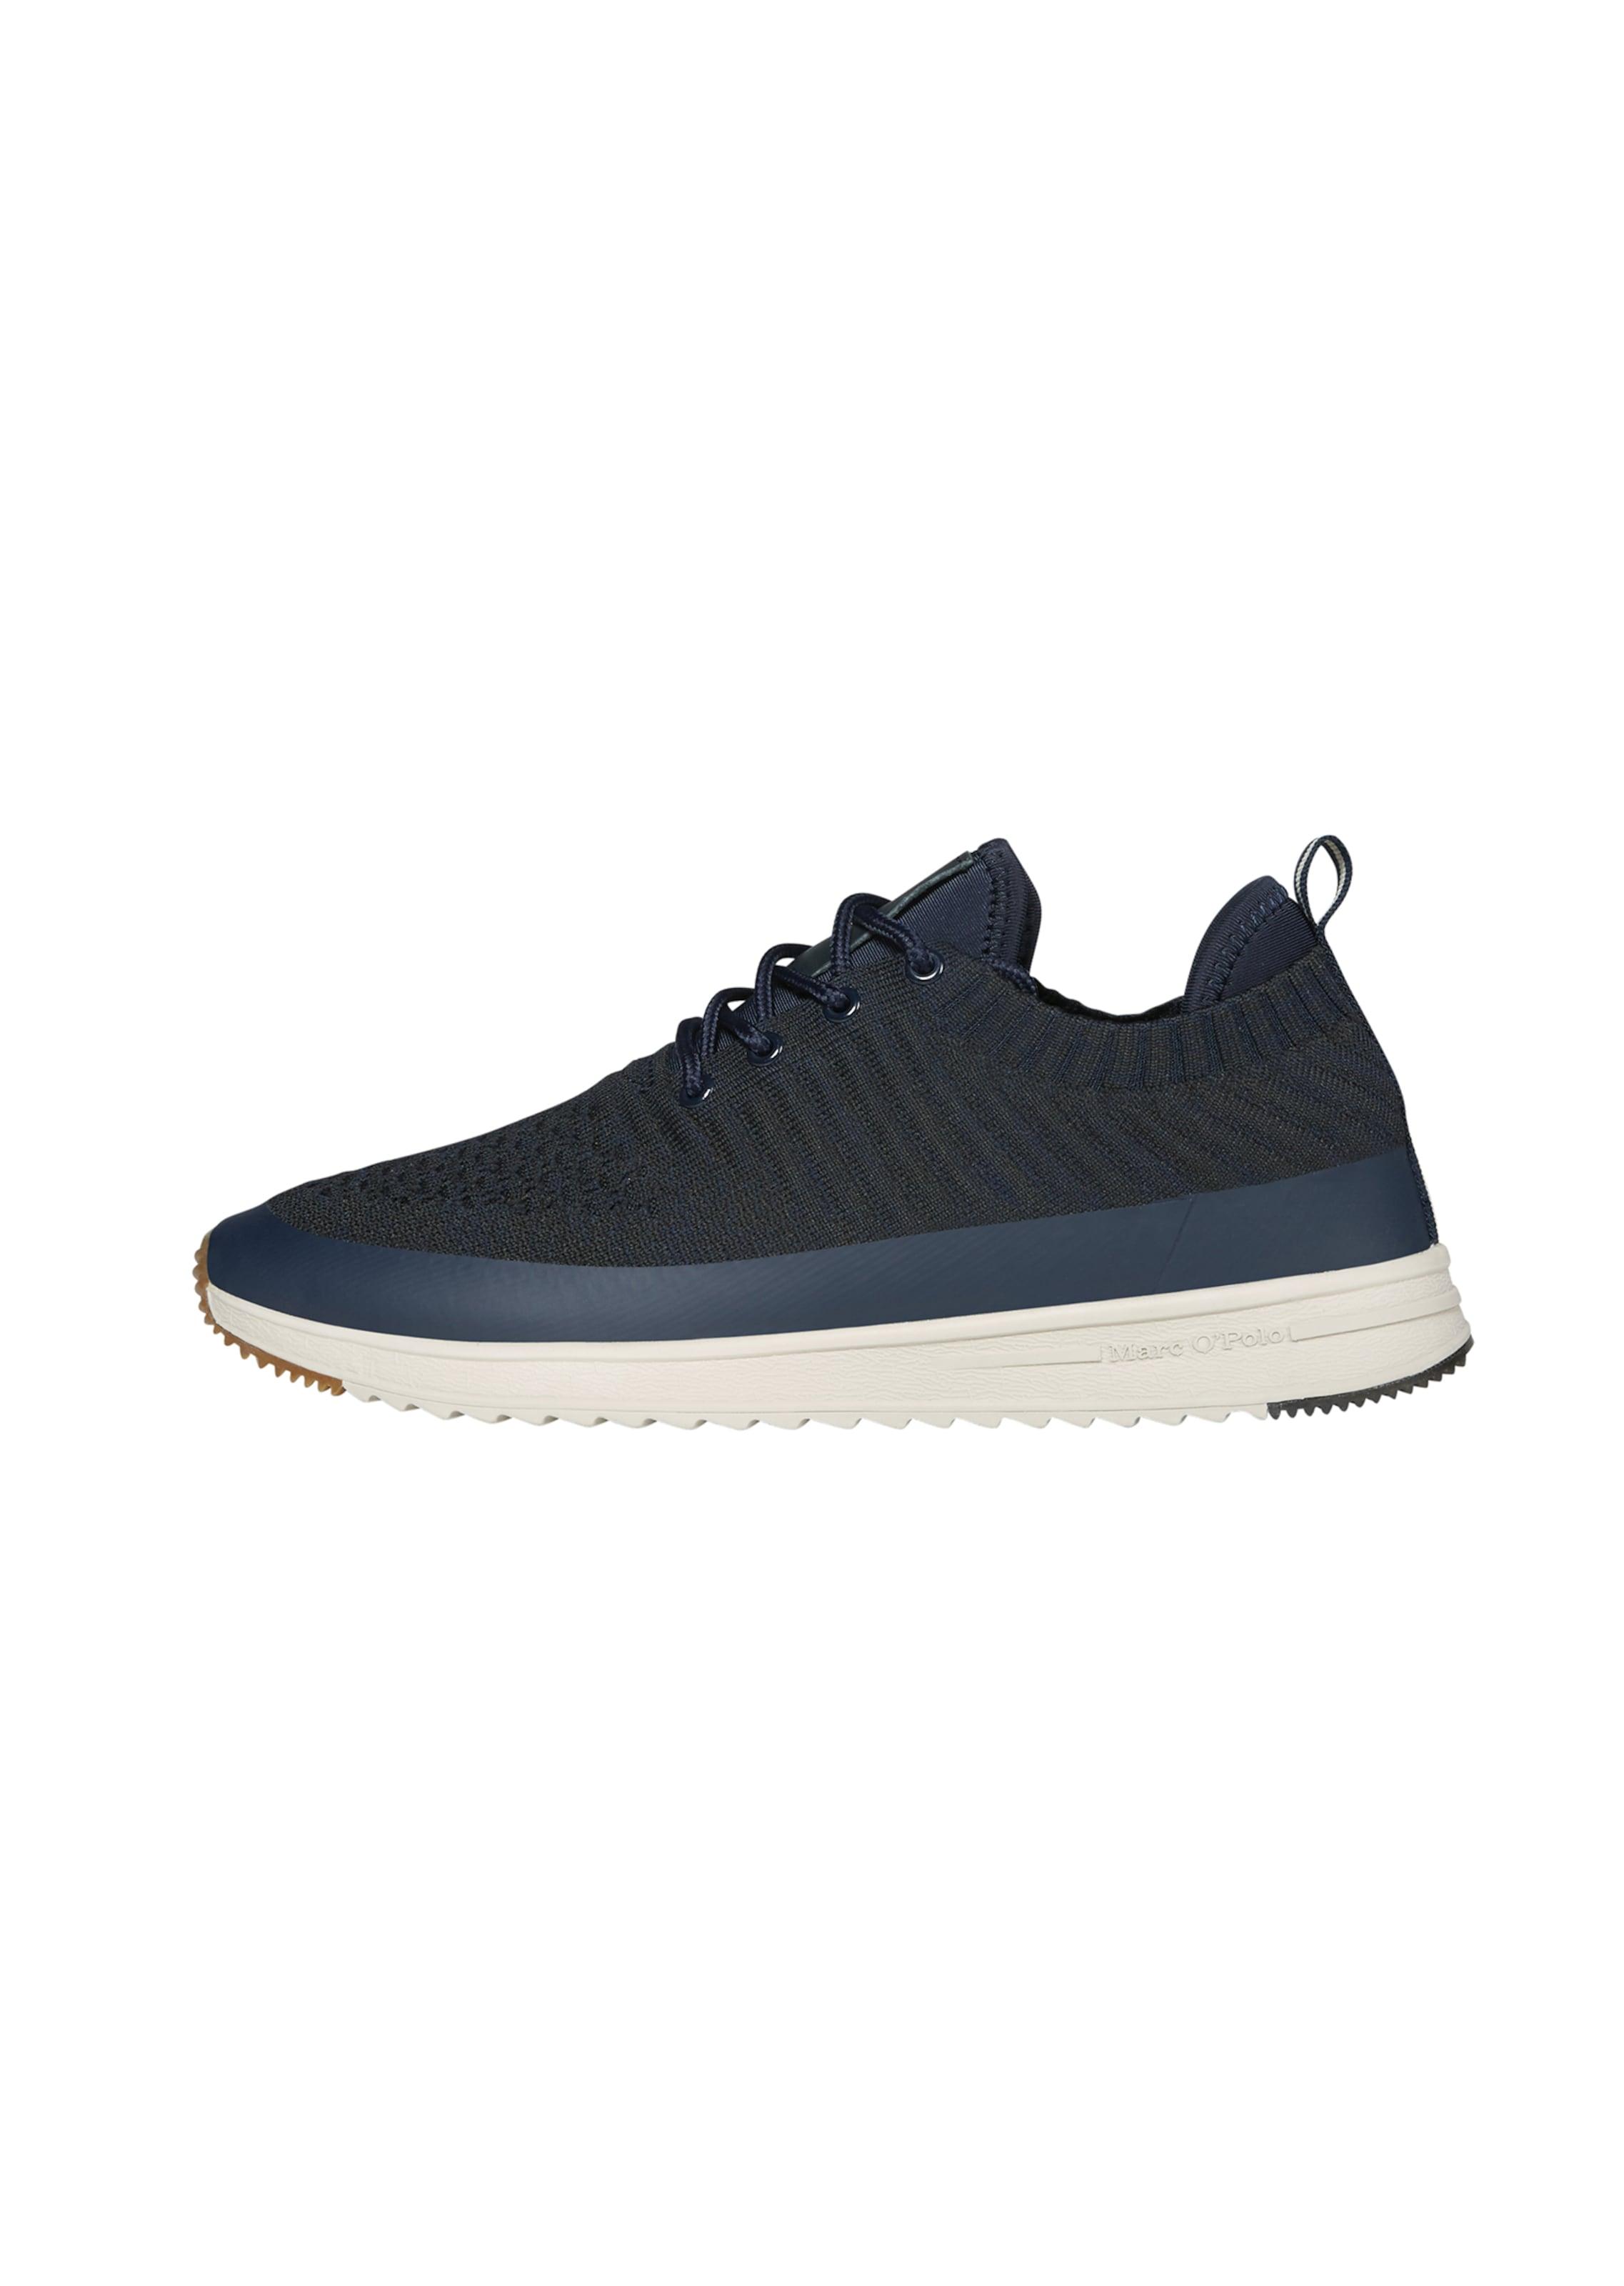 Haltbare Mode billige Schuhe Marc O'Polo | Sneaker Schuhe Schuhe Schuhe Gut getragene Schuhe ffd7d1